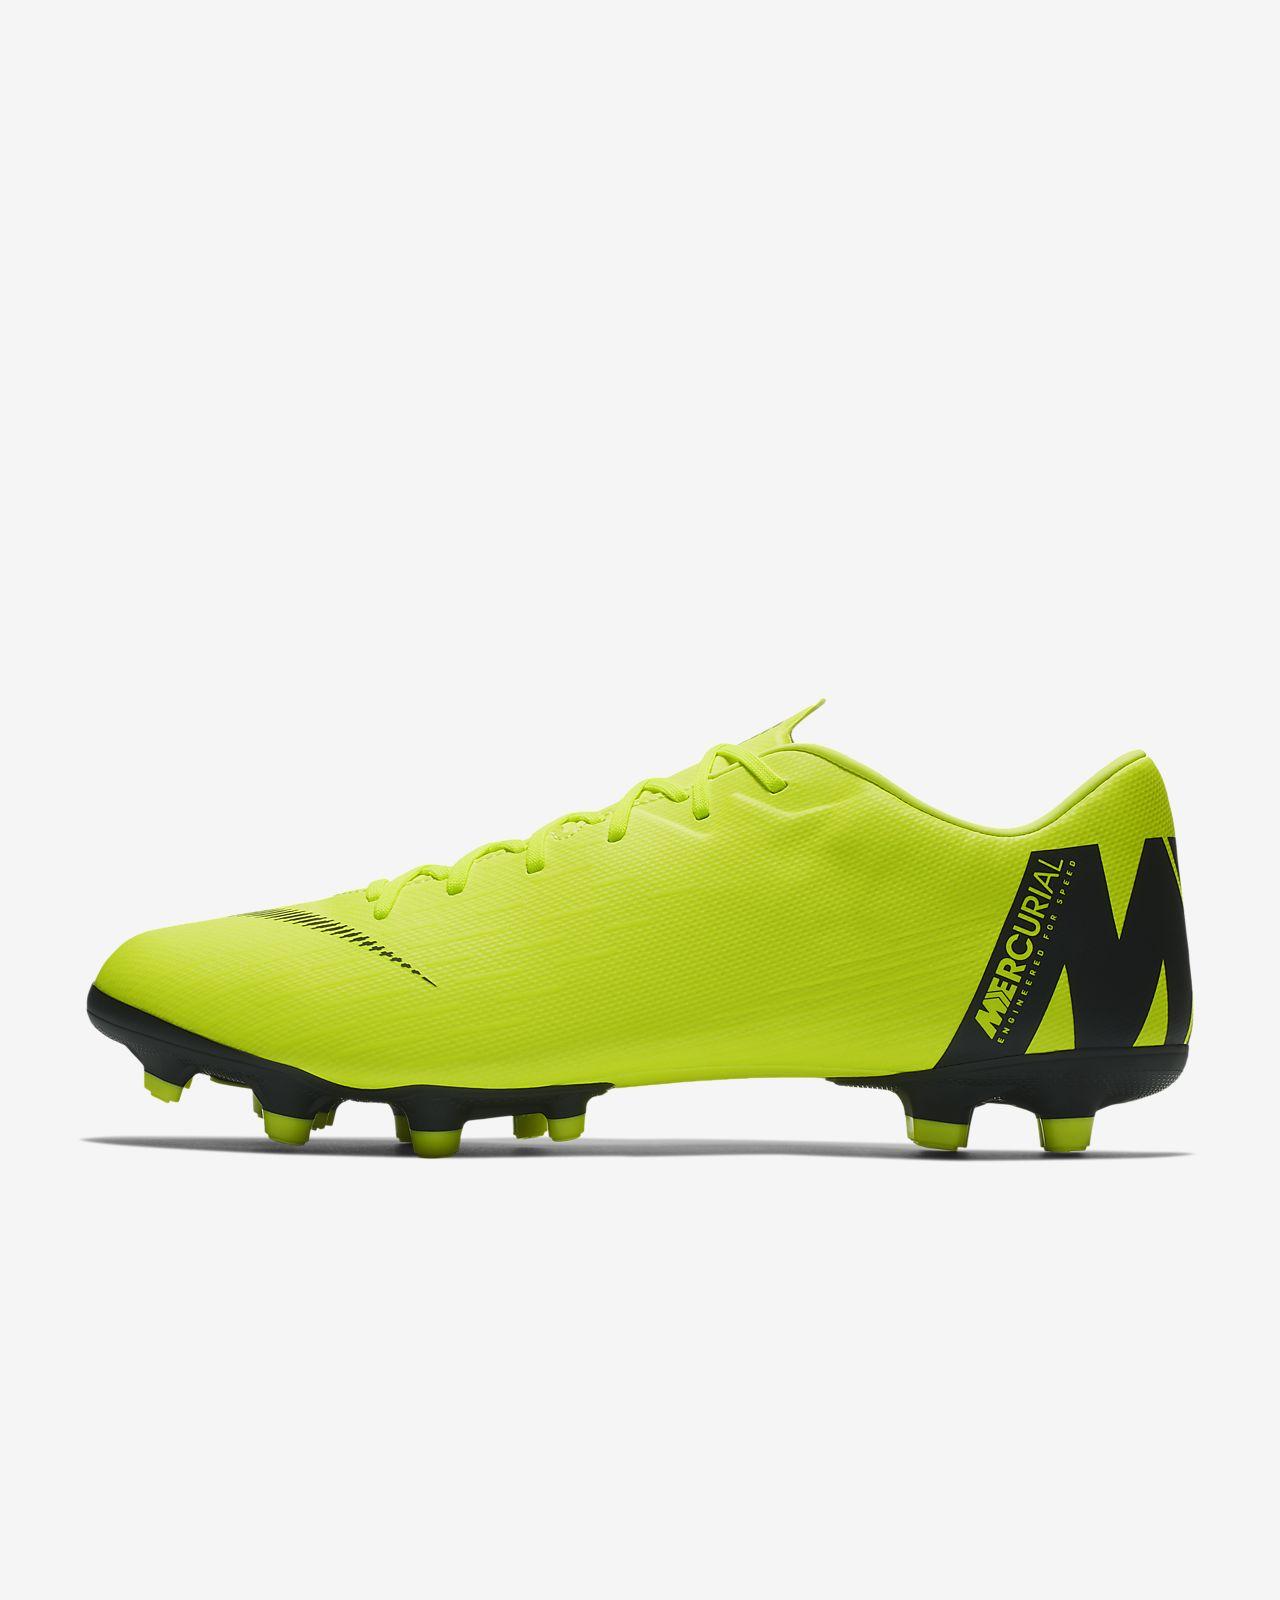 Scarpa da calcio multiterreno Nike Mercurial Vapor XII Academy